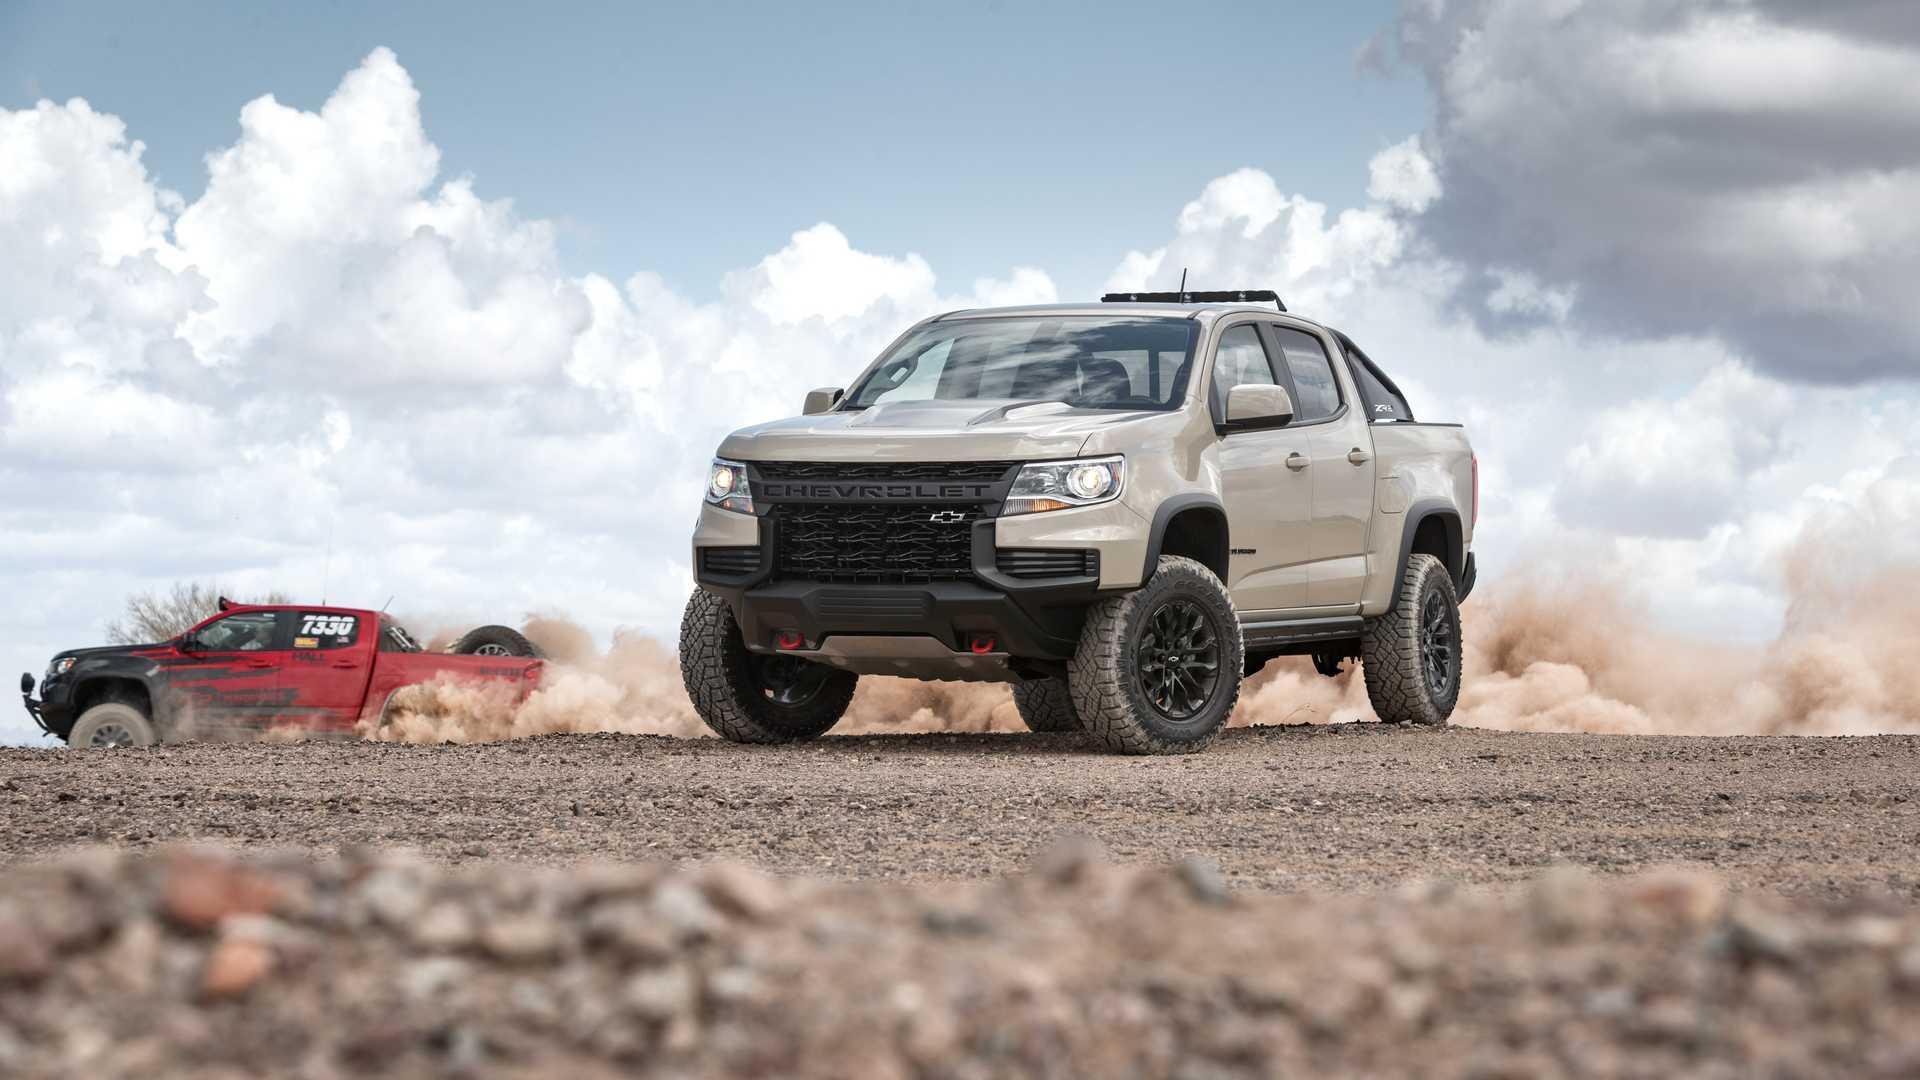 رونمایی پیکاپ تراک قدرتمند Chevrolet Colorado 2021 +تصاویر